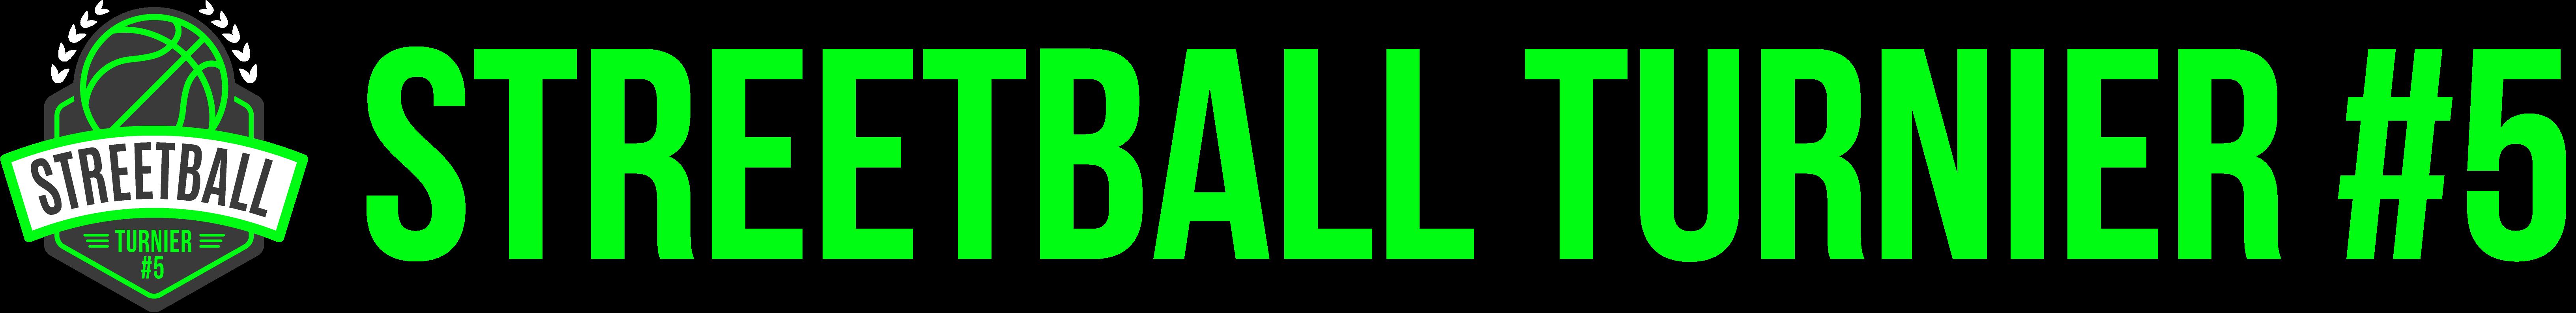 Streetball Turnier #5